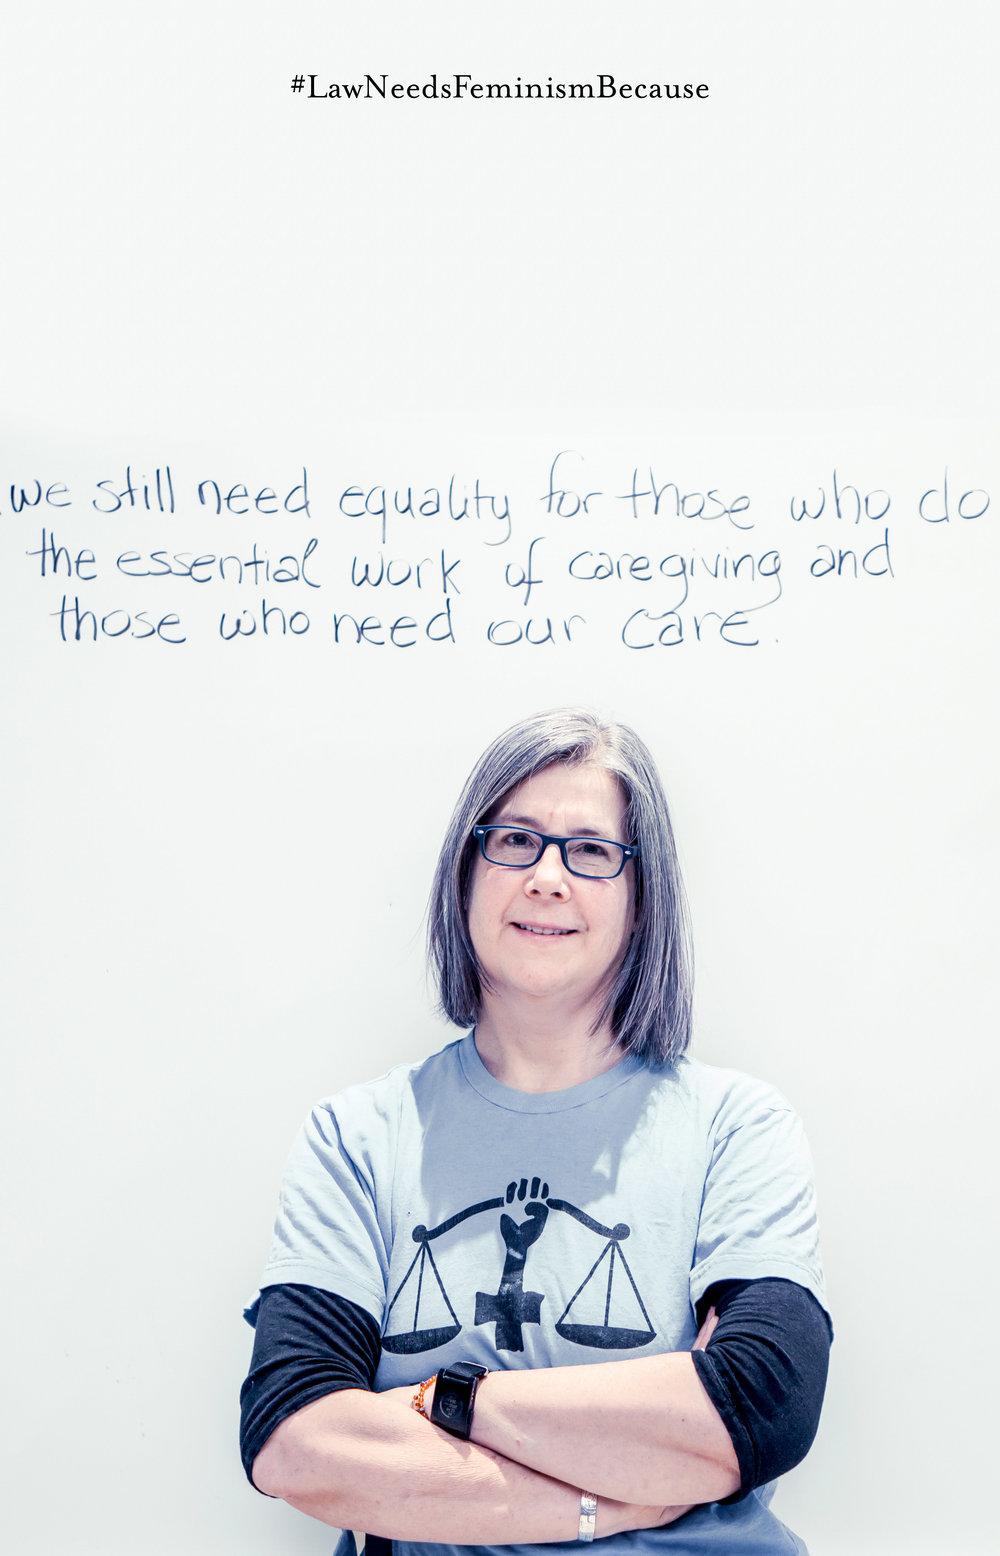 #LawNeedsFeminismBecause-15.jpg